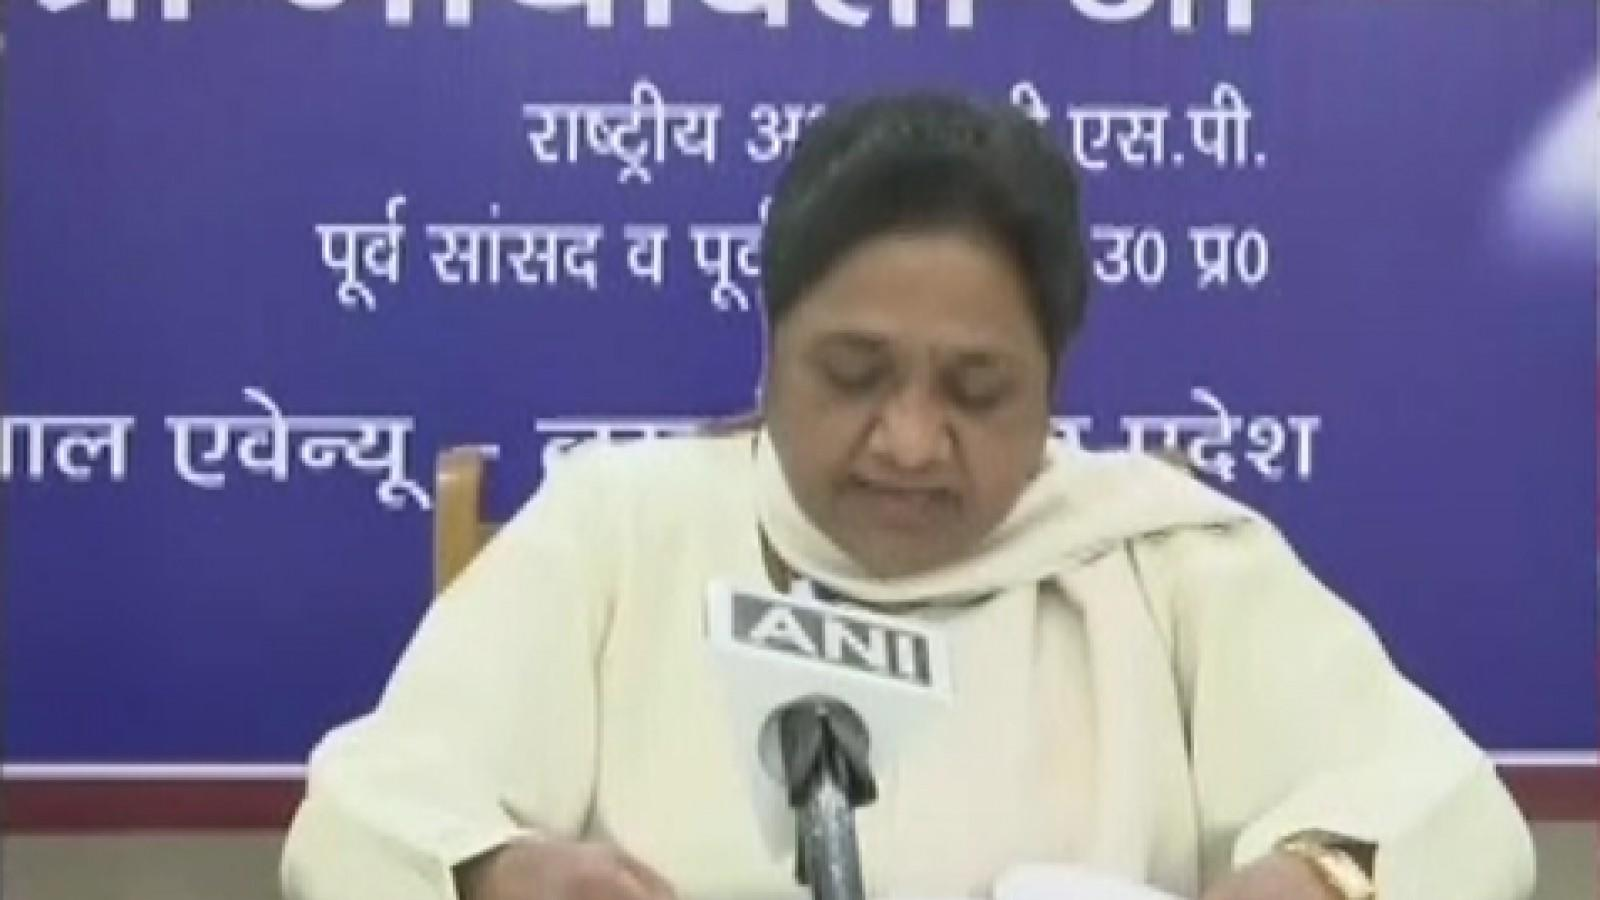 bsp-supremo-mayawati-reiterates-accusations-of-evm-tampering